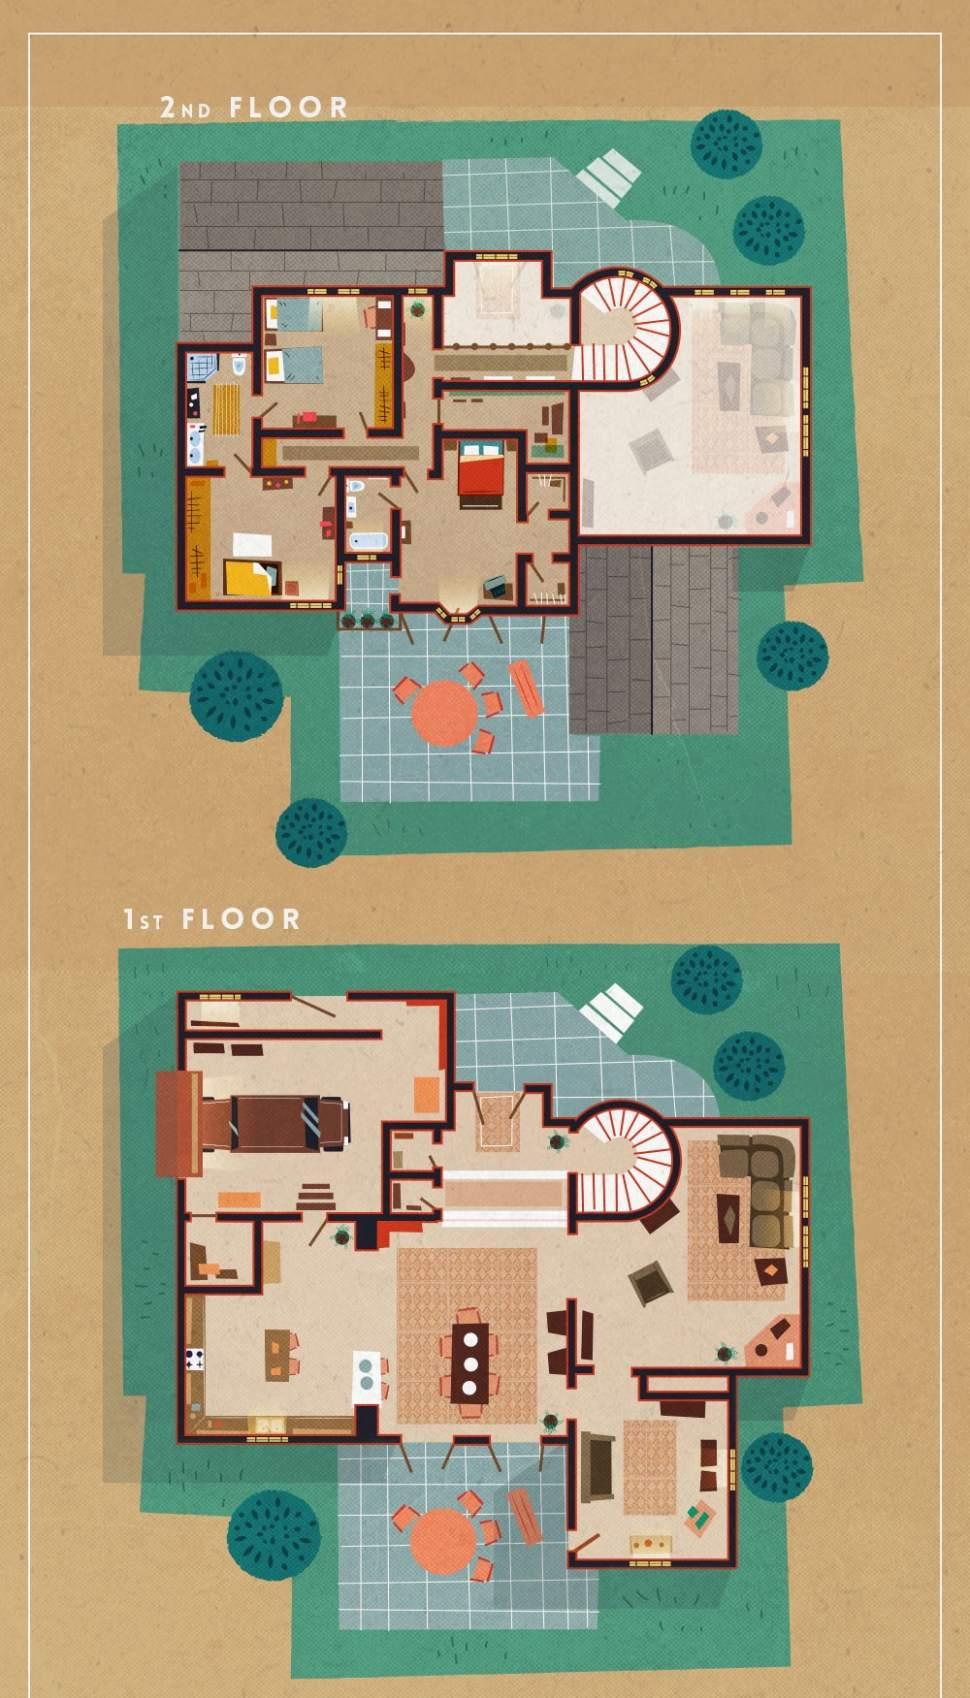 un portal inmobiliario recrea planos de casas de series On planos de casas famosas